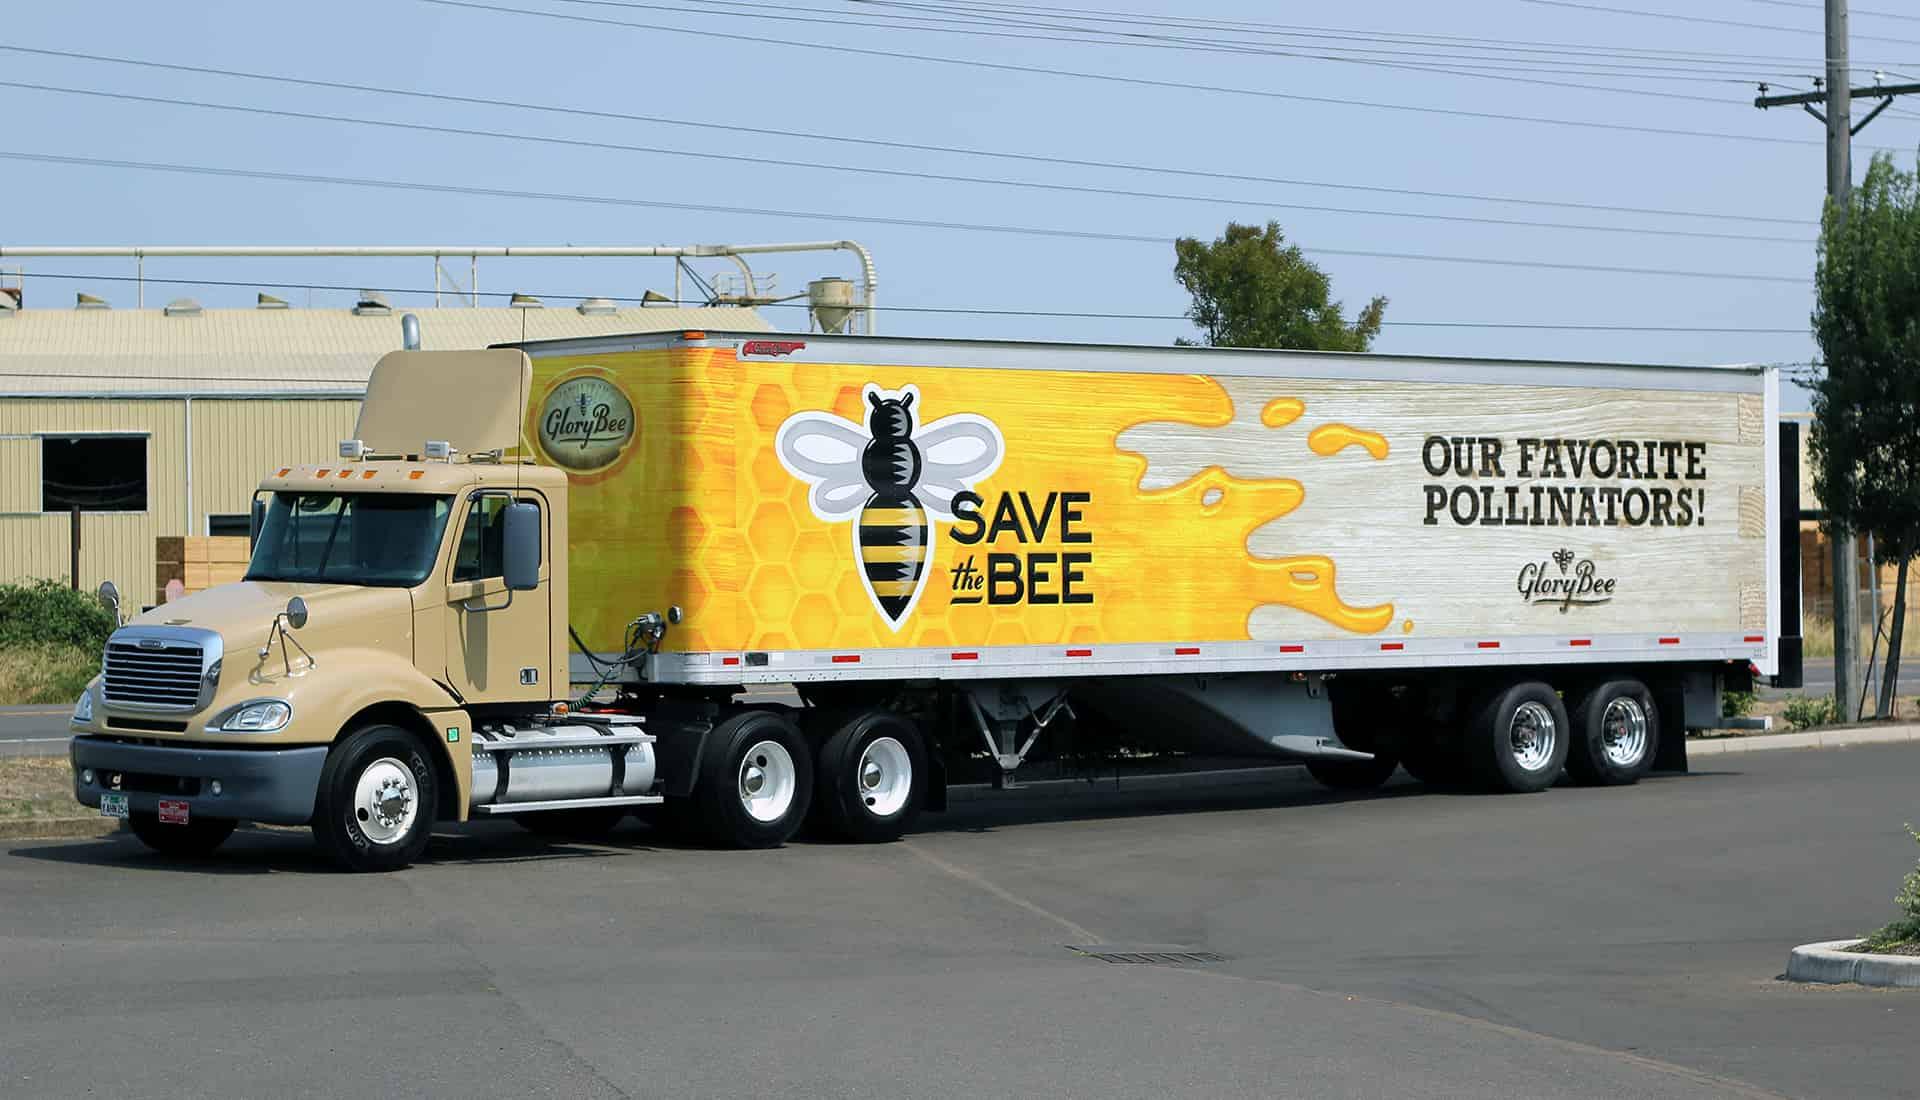 https://www.honeysource.com/wp-content/uploads/2021/05/stb-truck.jpg